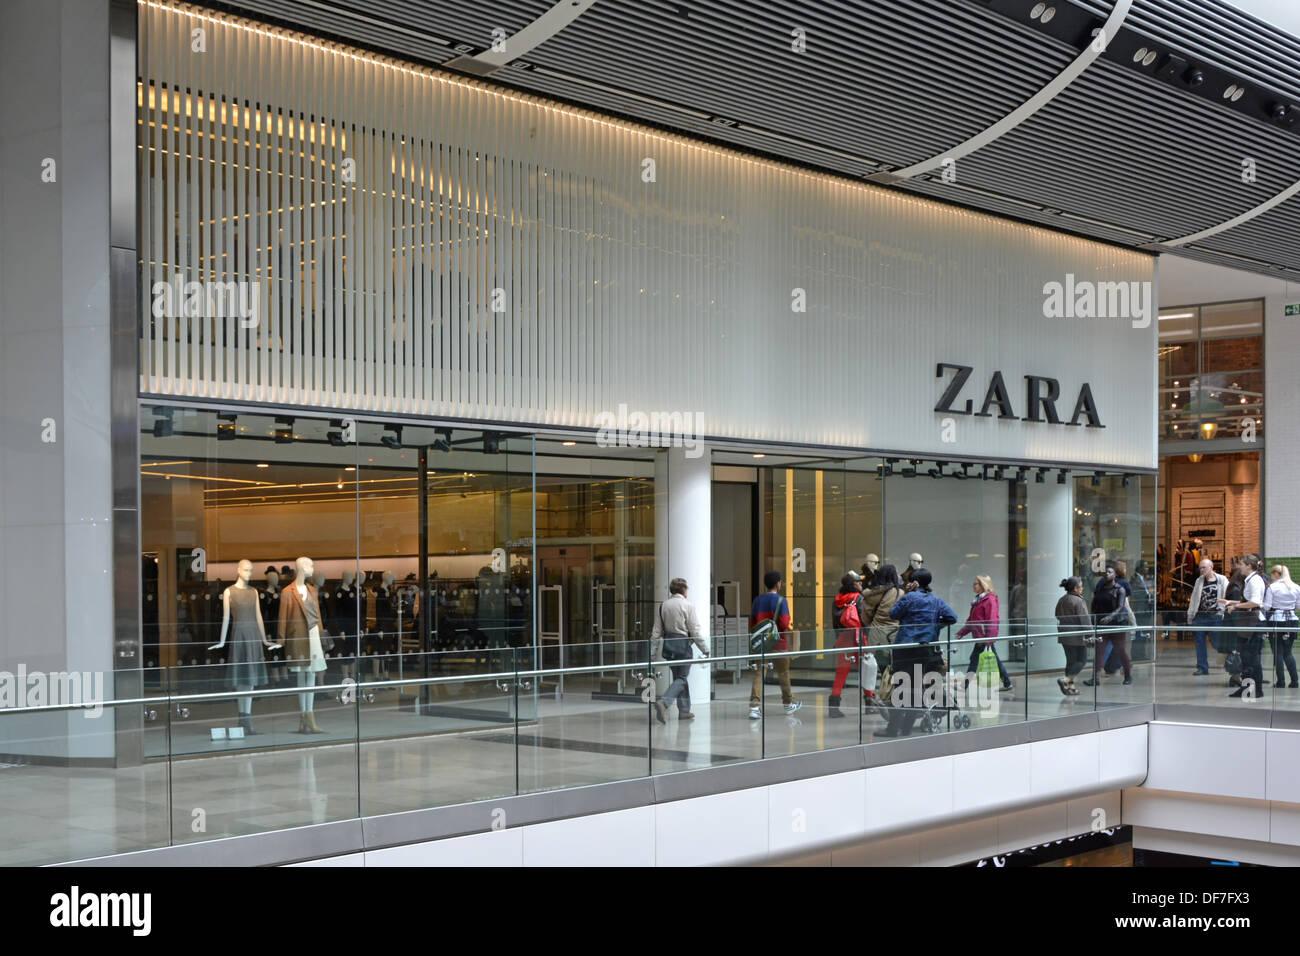 Zara shop front in shopping mall Stock Photo  61017099 - Alamy 71a5b7b1b0